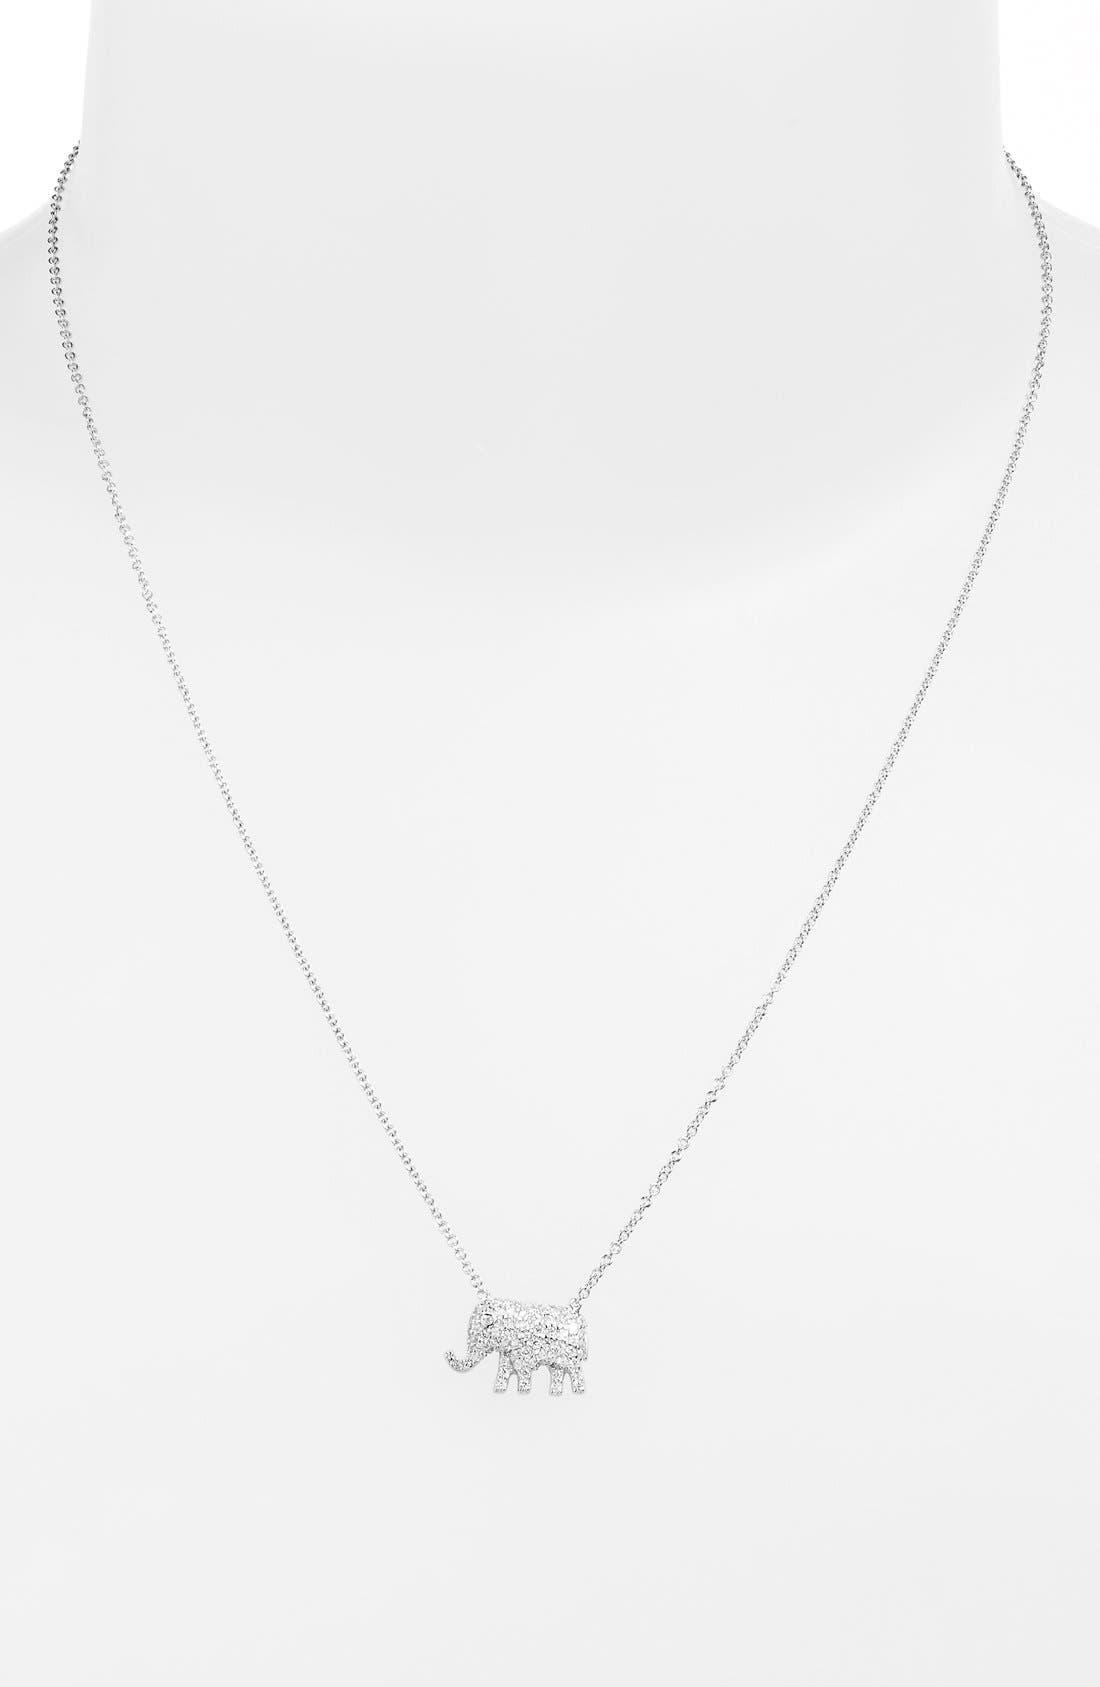 Main Image - Sugar Bean Jewelry Pavé Elephant Pendant Necklace